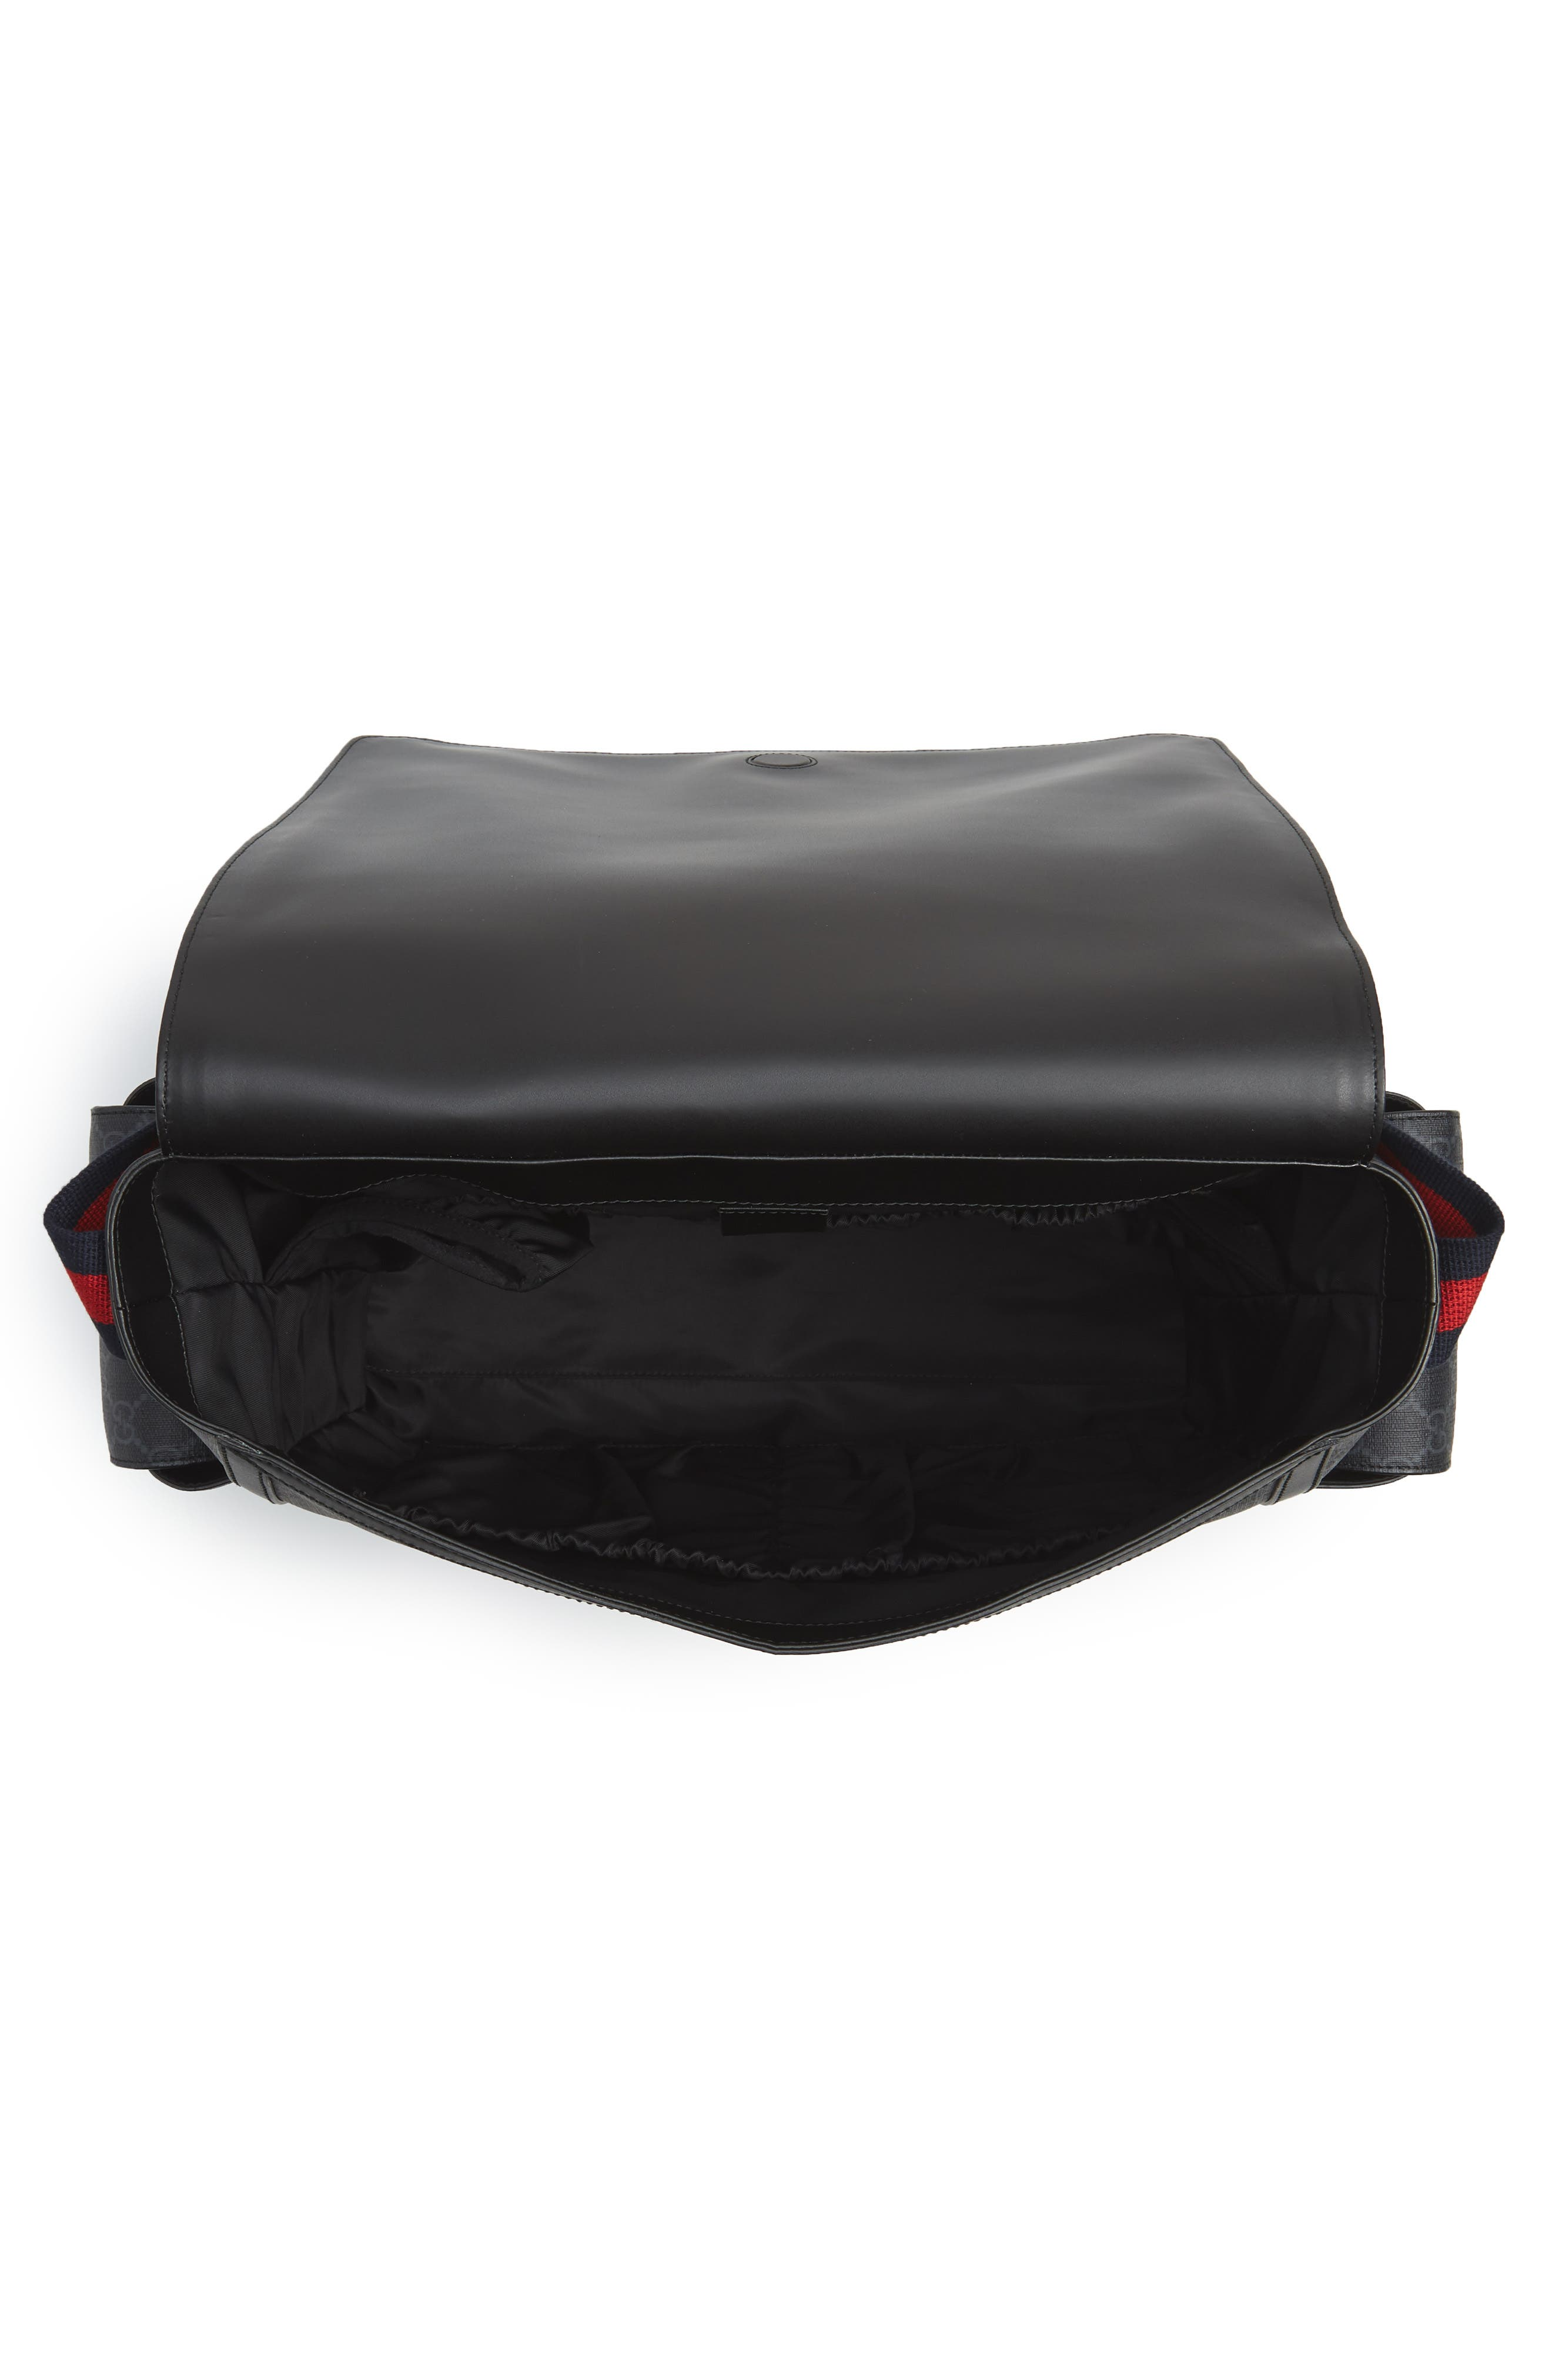 GG Supreme Canvas Diaper Bag,                             Alternate thumbnail 4, color,                             007